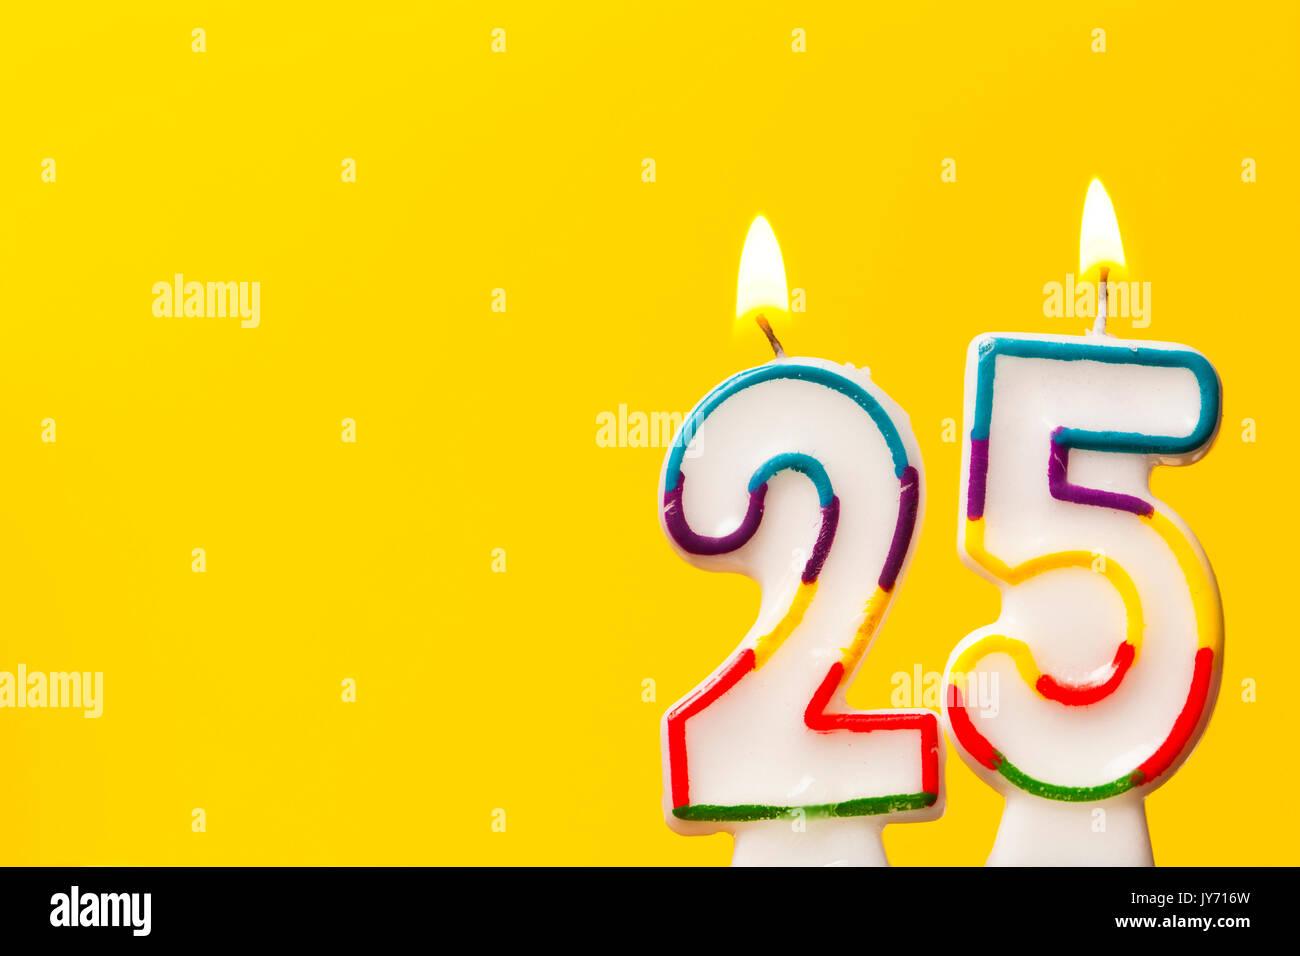 25 birthday stockfotos 25 birthday bilder alamy - 25 geburtstag bilder ...